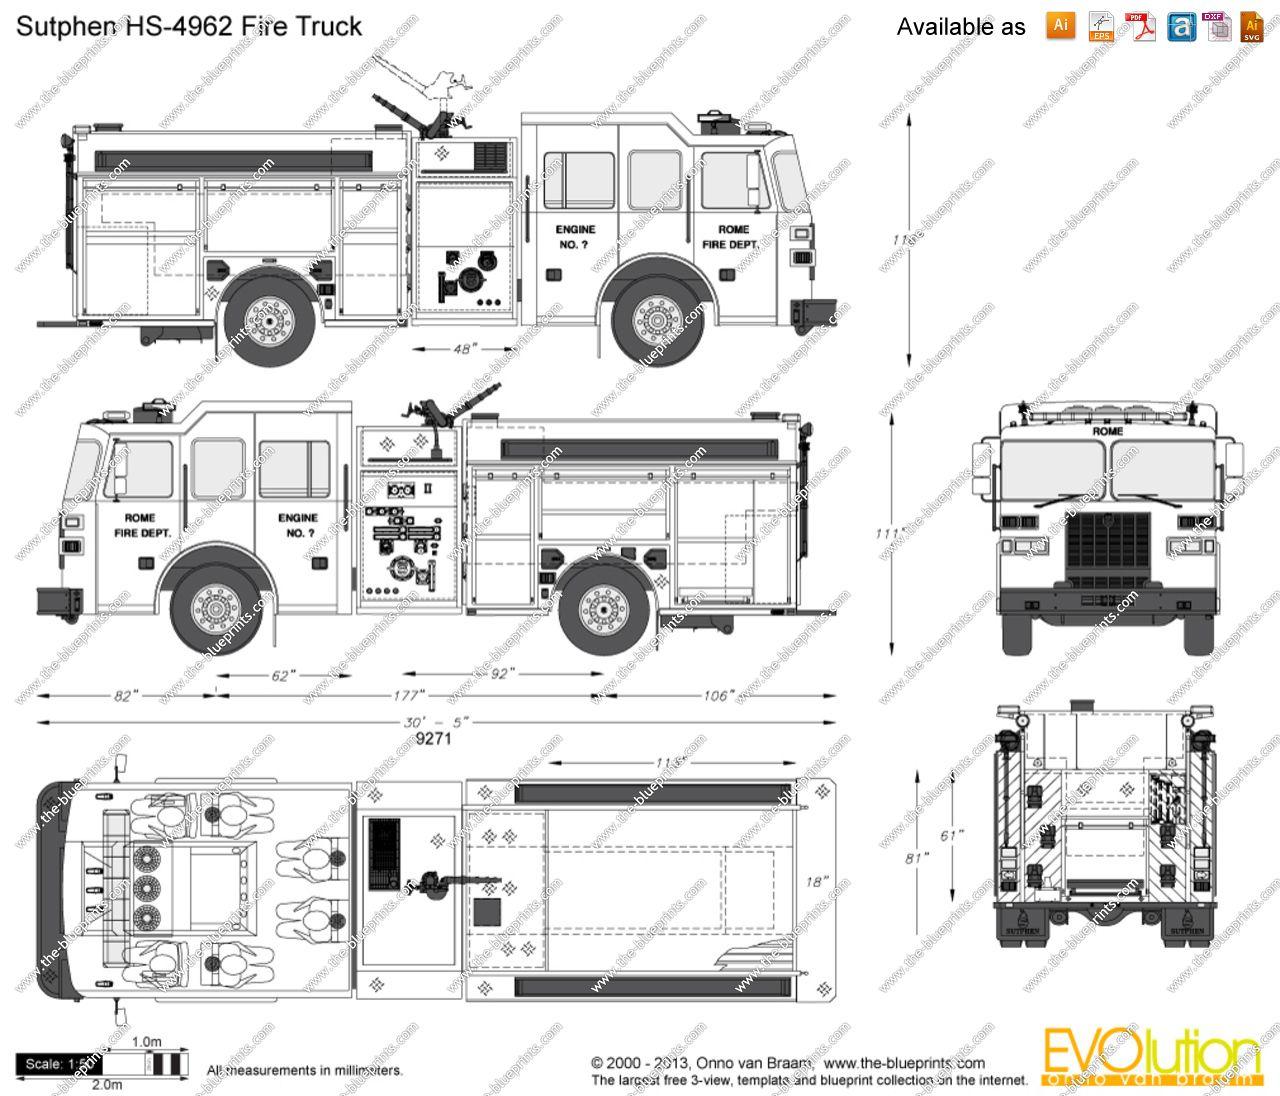 Sutphen Hs Fire Truck